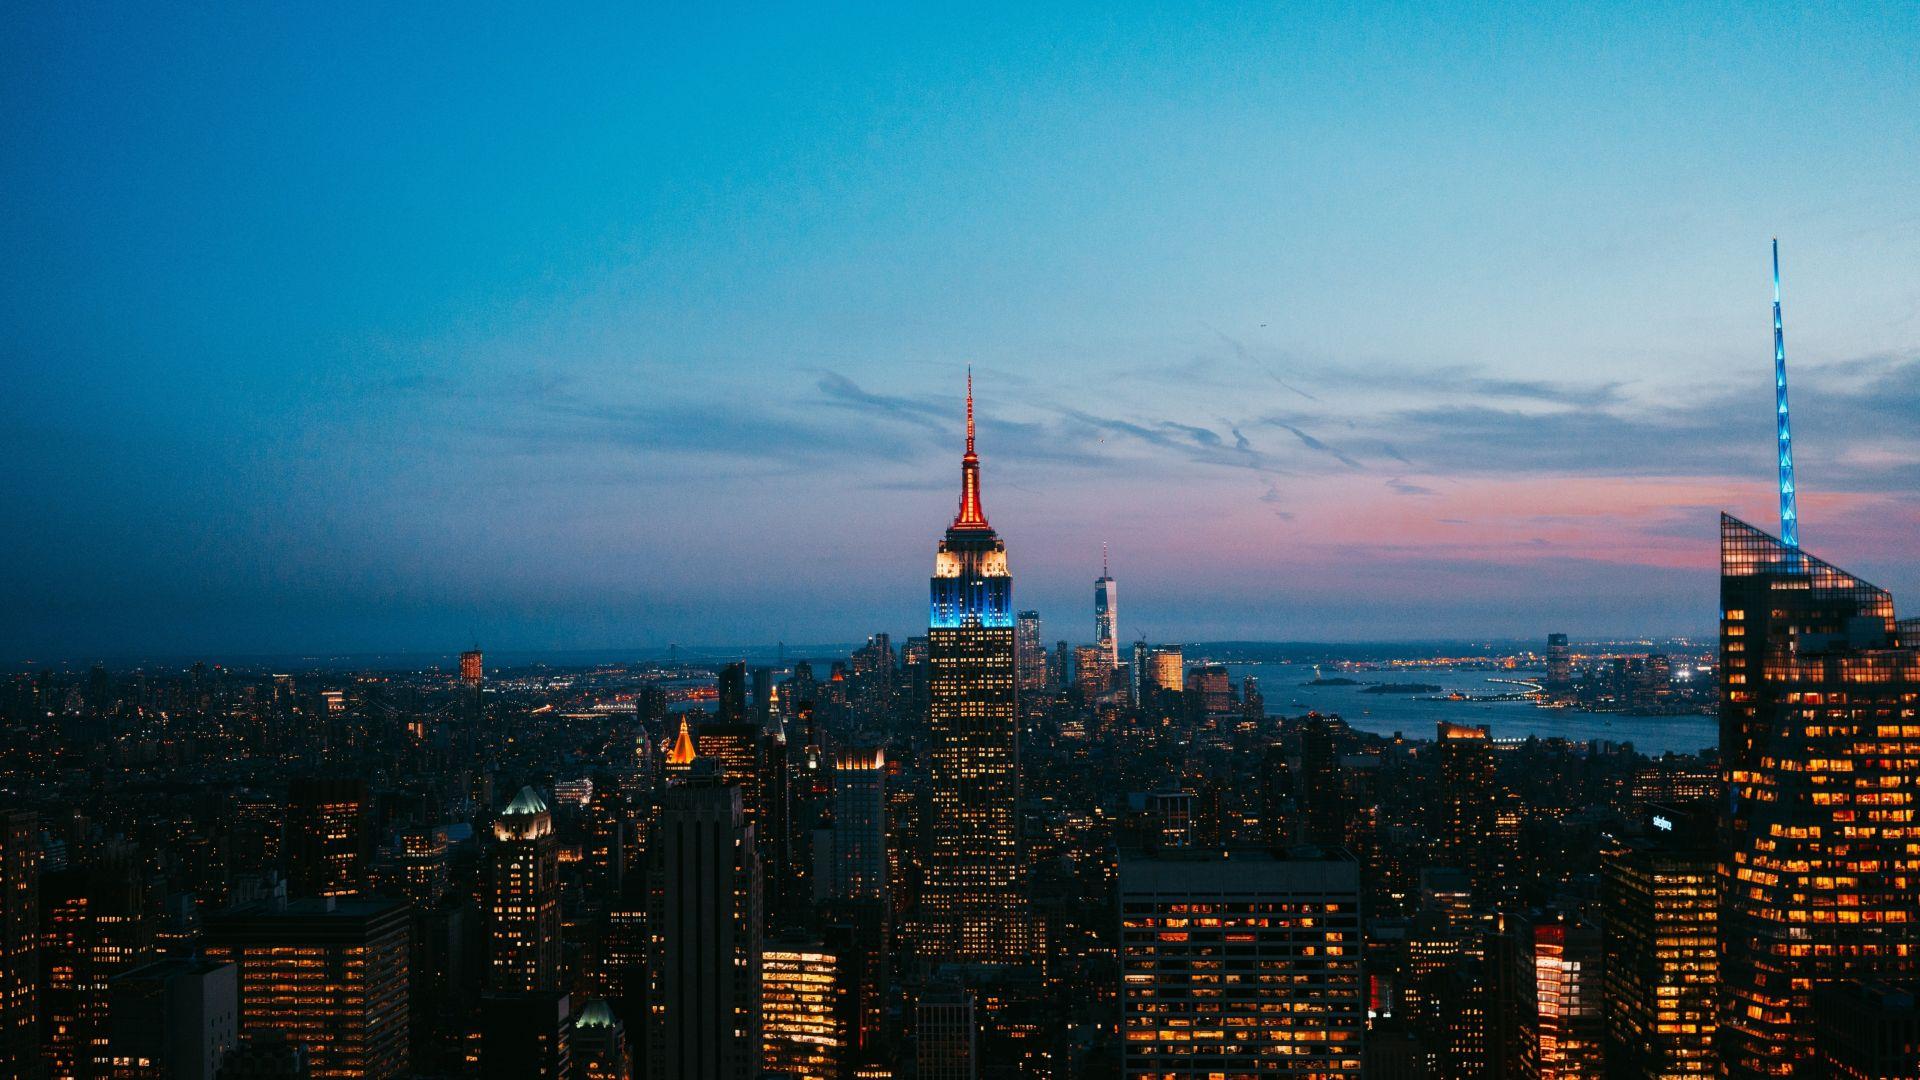 Wallpaper New york, Empire State building, buildings, skyscrapers, night, city, 5k